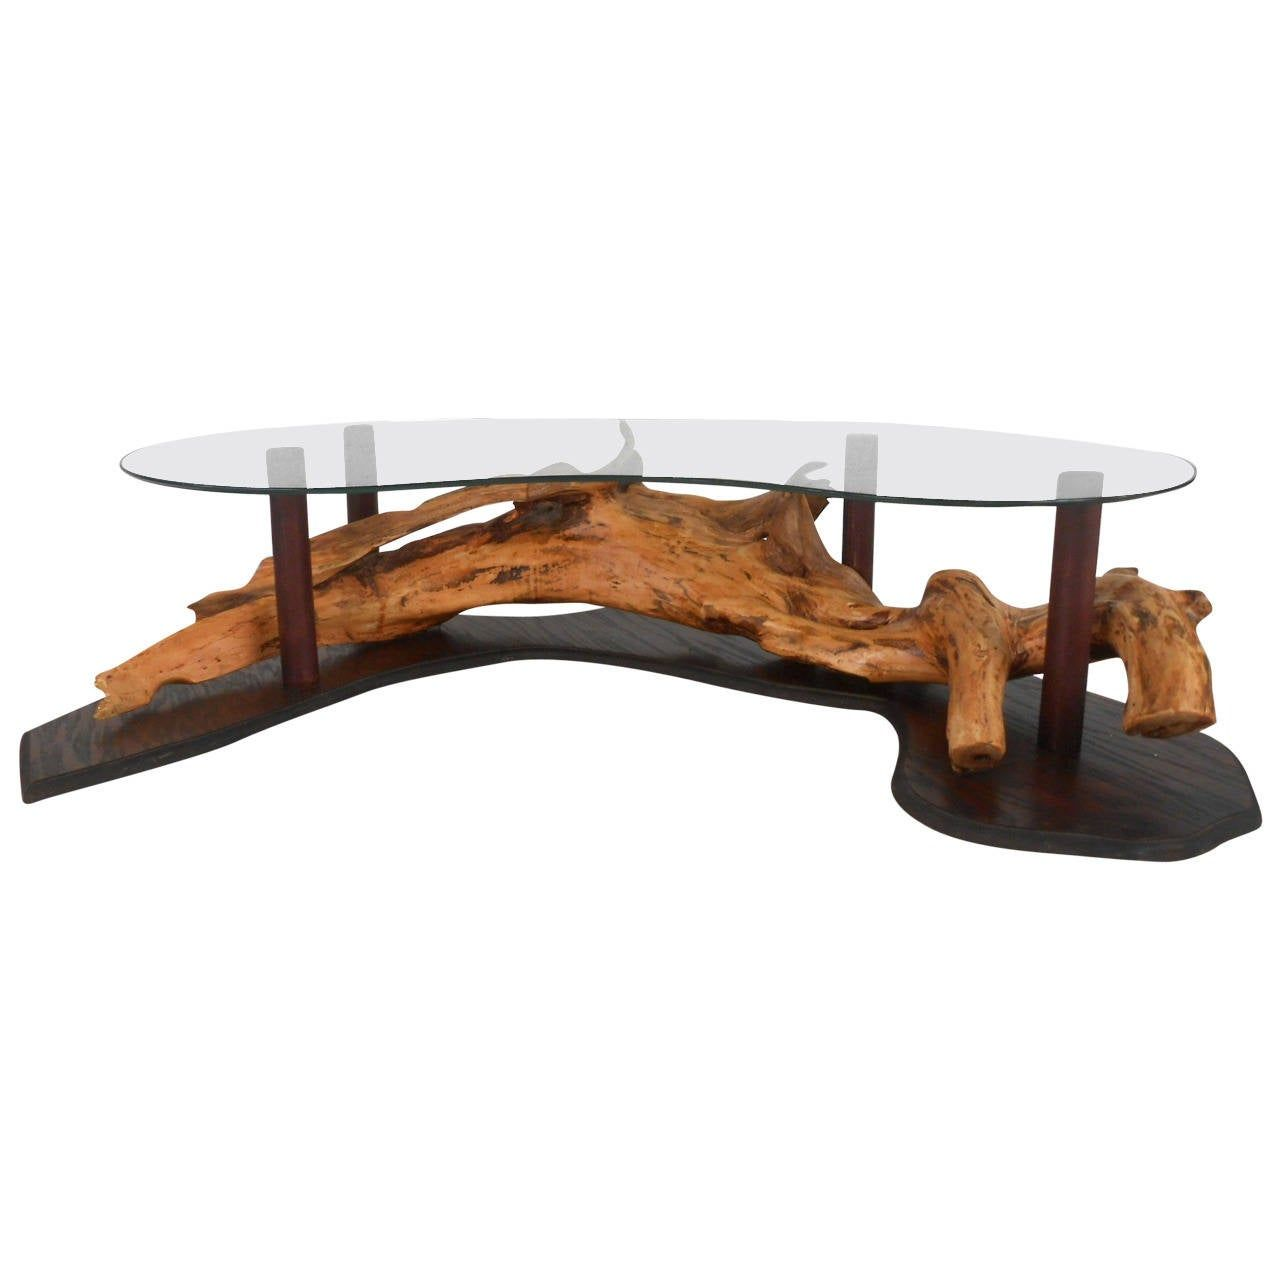 Unique Mid Century Modern Rustic Driftwood Glass Top Coffee Table In 2021 Driftwood Coffee Table Modern Square Coffee Table Glass Top Coffee Table [ 1280 x 1280 Pixel ]